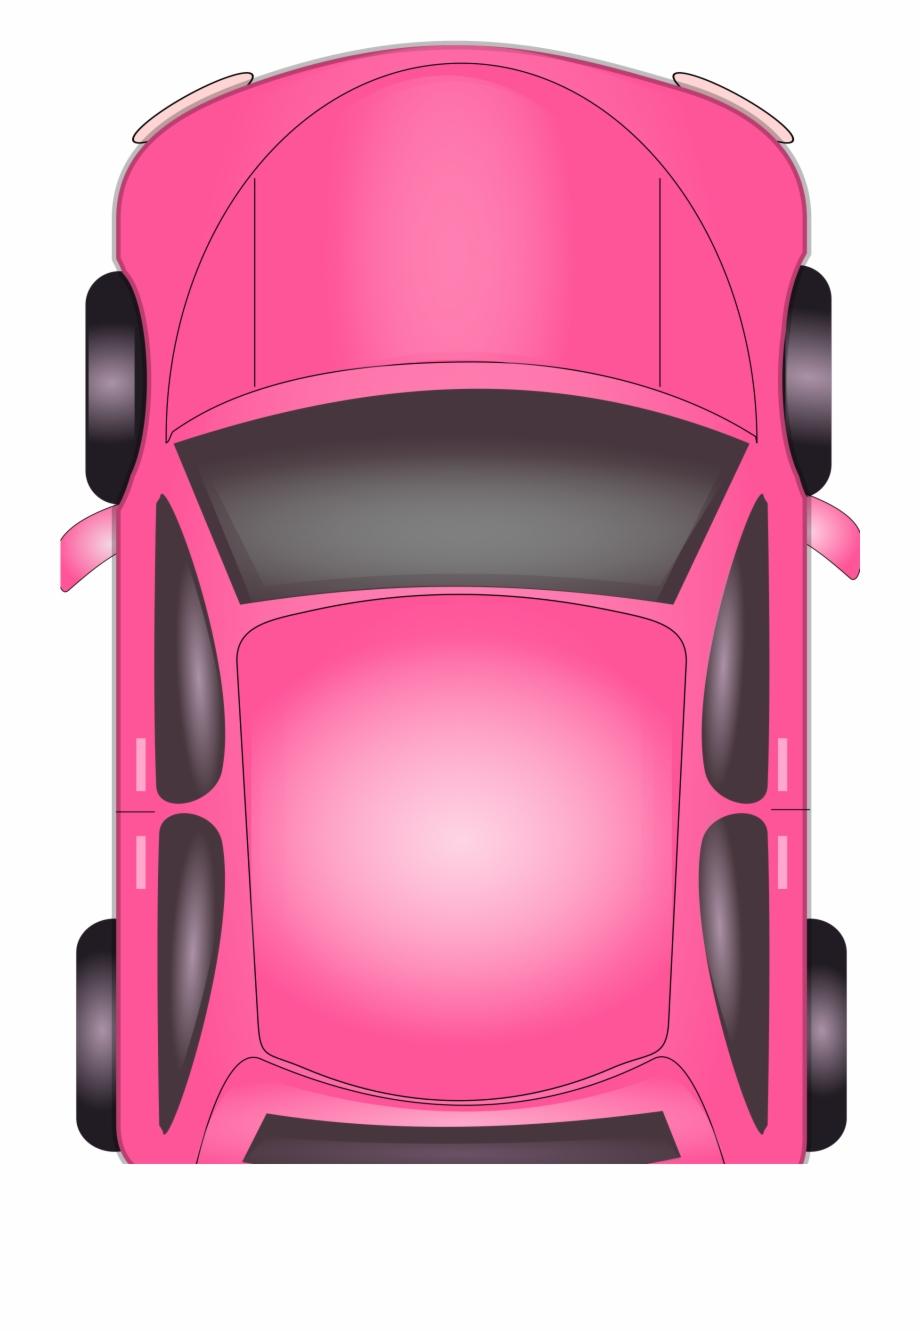 Free Car Plan View Png, Download Free Clip Art, Free Clip.